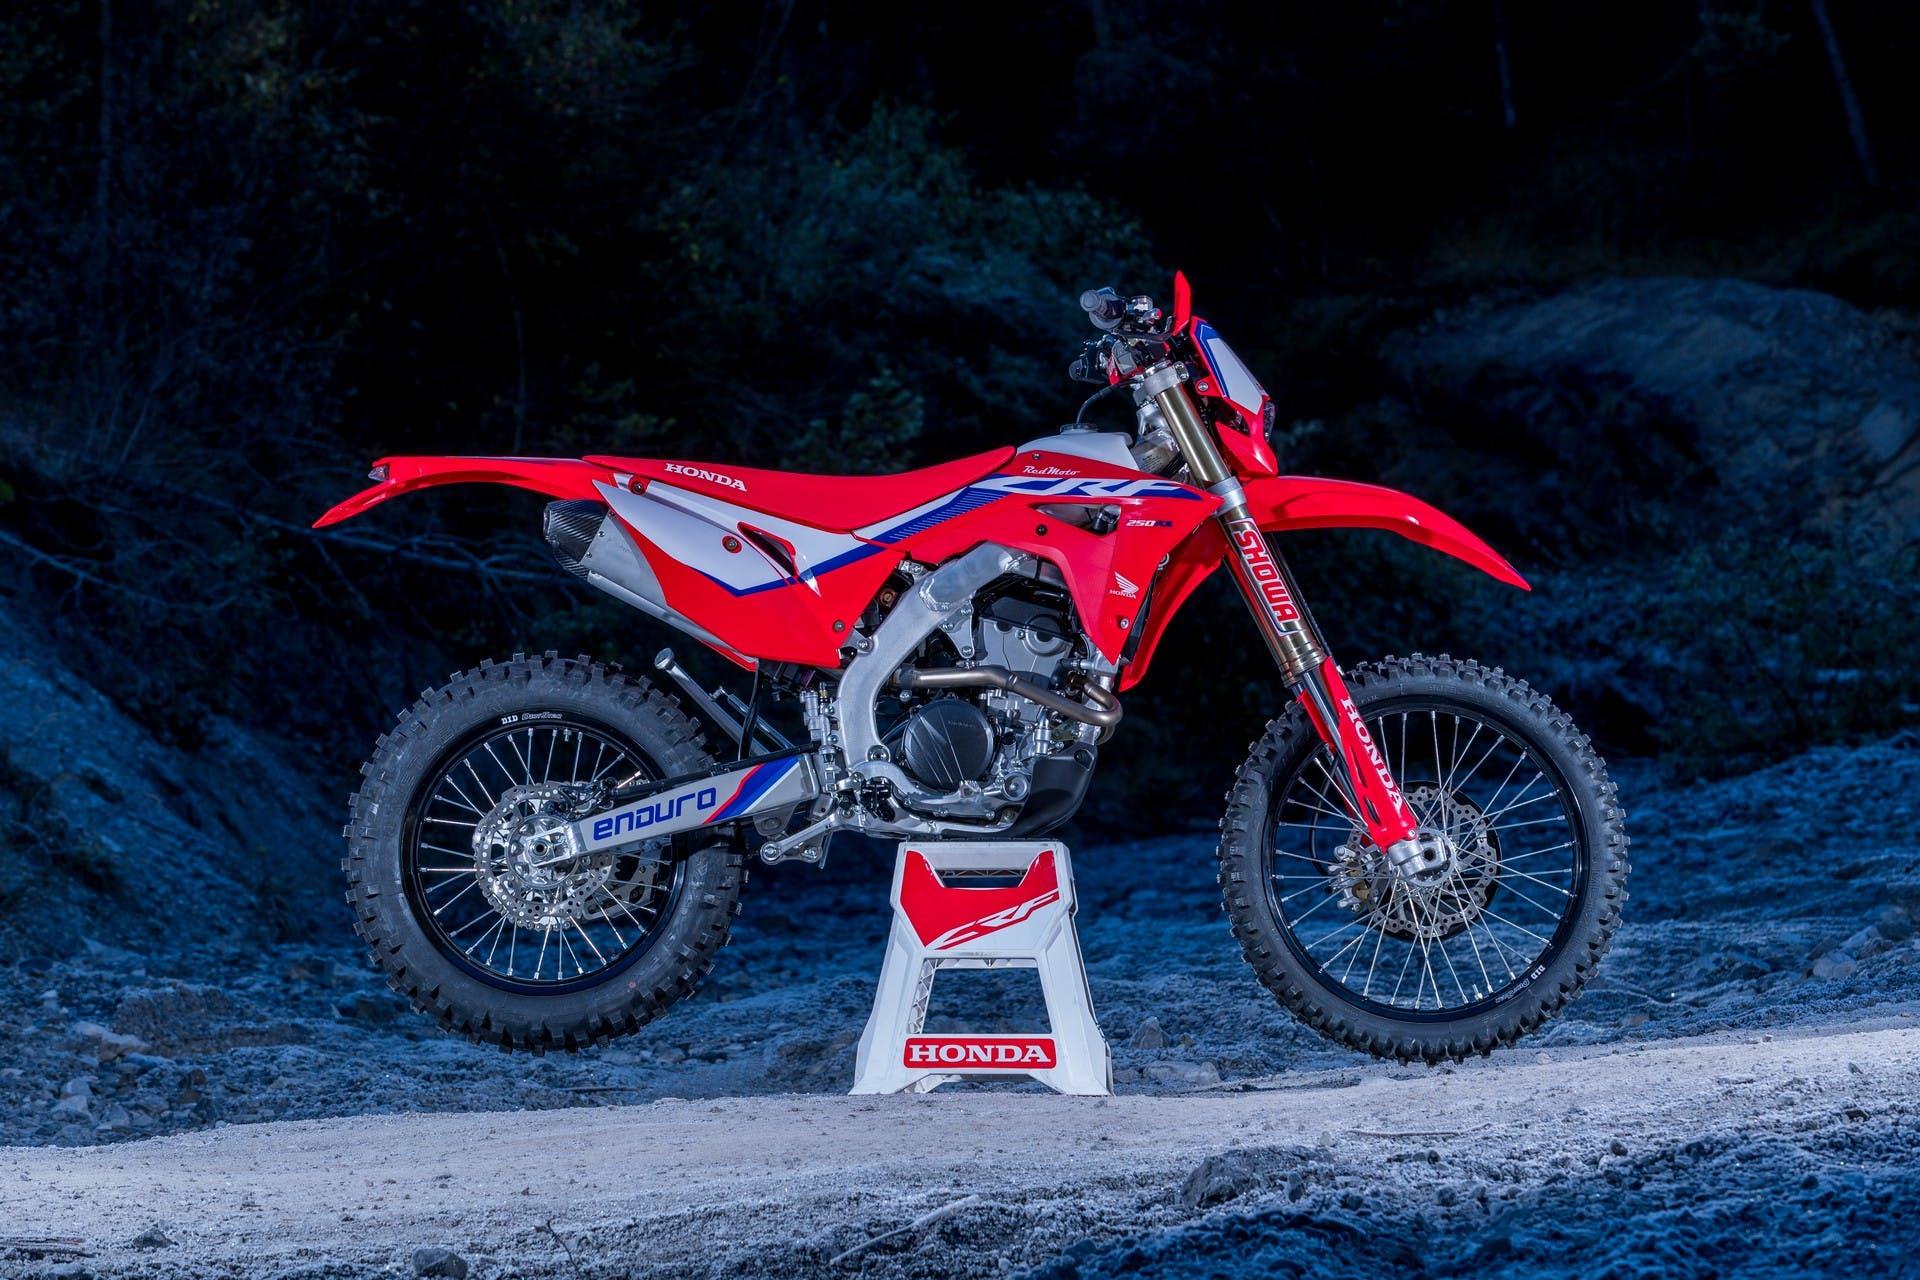 Honda CRF250RX Migliori moto da enduro 2021